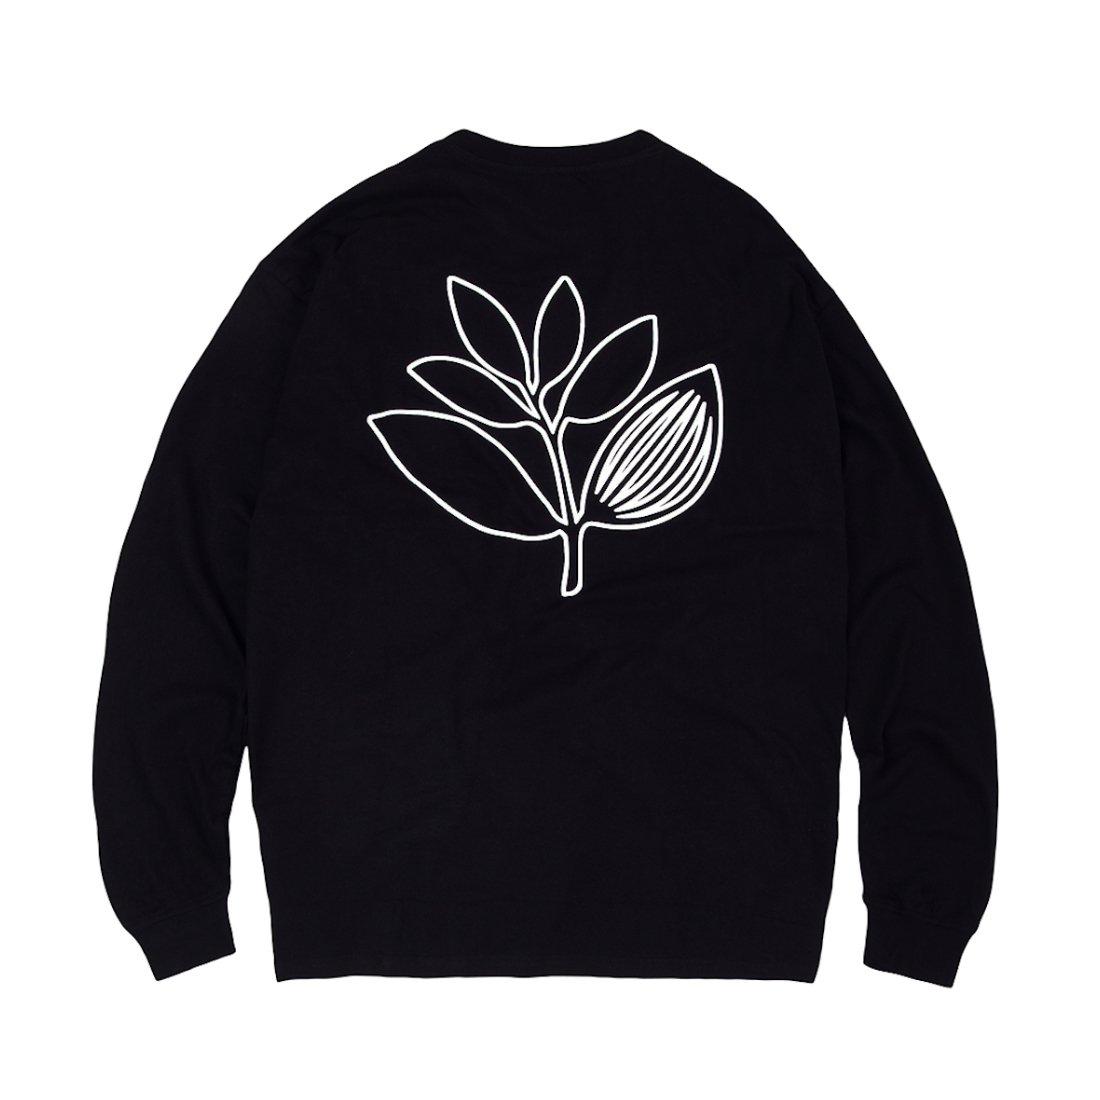 【Magenta Skateboards】Plant Outline L/S Tee - Black/White